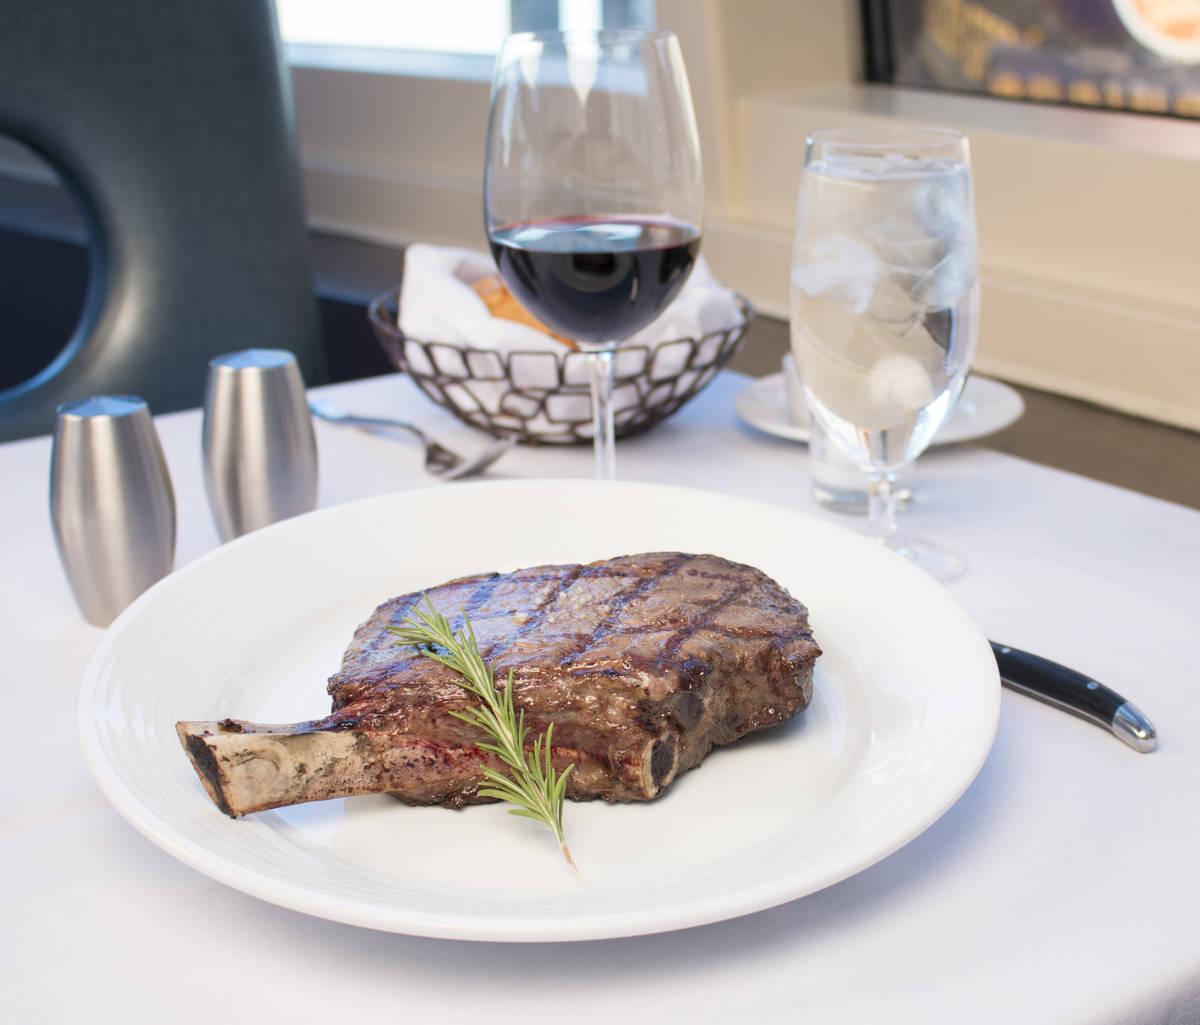 Oscar's Steakhouse at the Plaza will reopen for dinner service on June 18. (Oscar's Steakhouse)